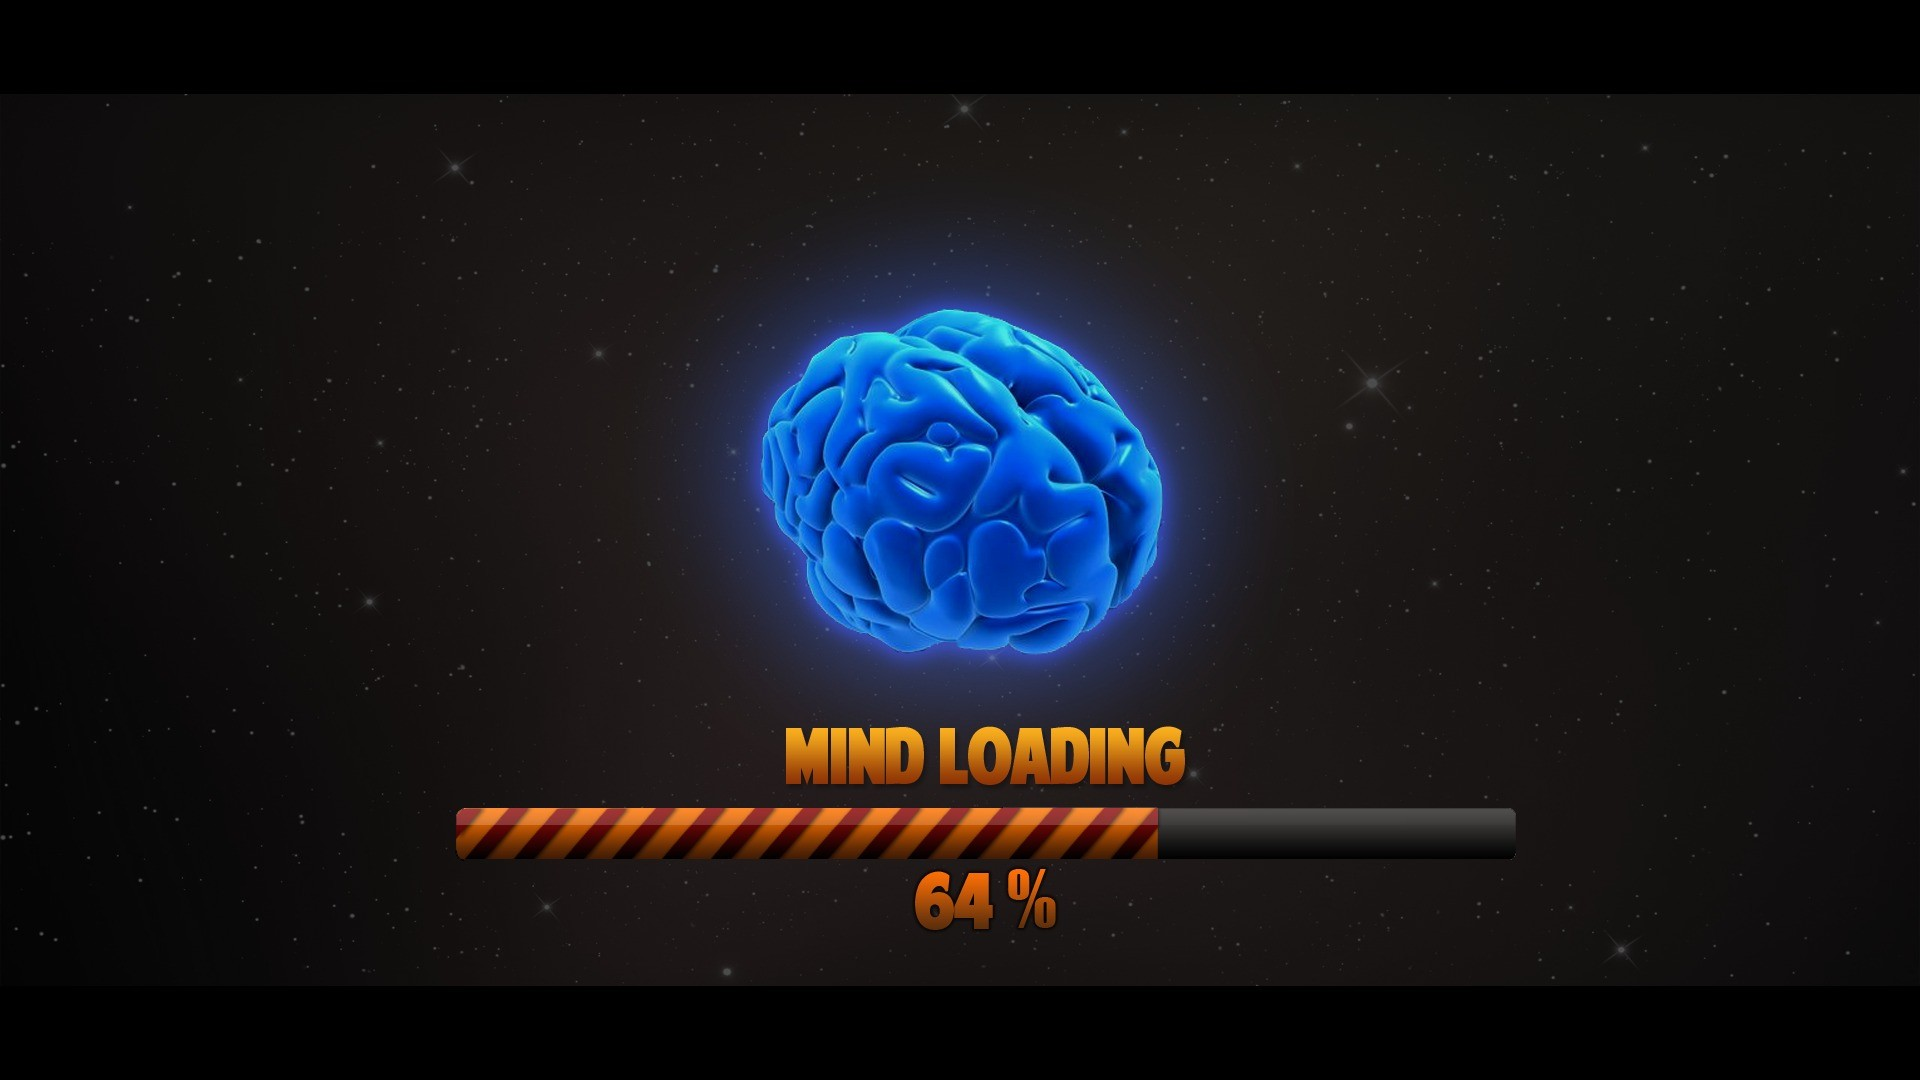 Mind Loading Hd Wallpaper Background Image 1920x1080